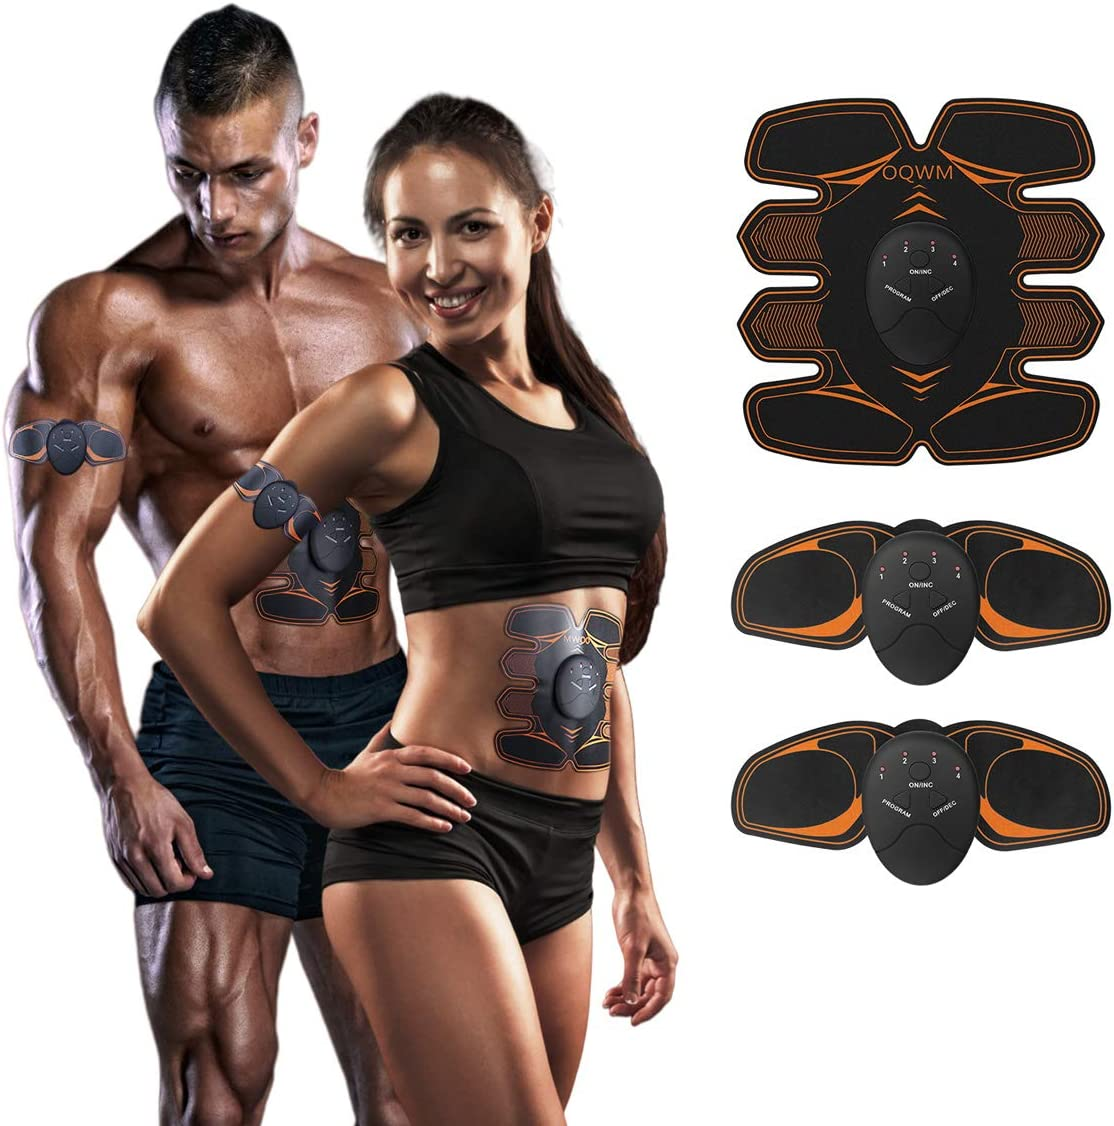 A-TION 8PCS Abs Stimulator Abdominal Muscle EMS Hip Trainer Toning Belt Waist